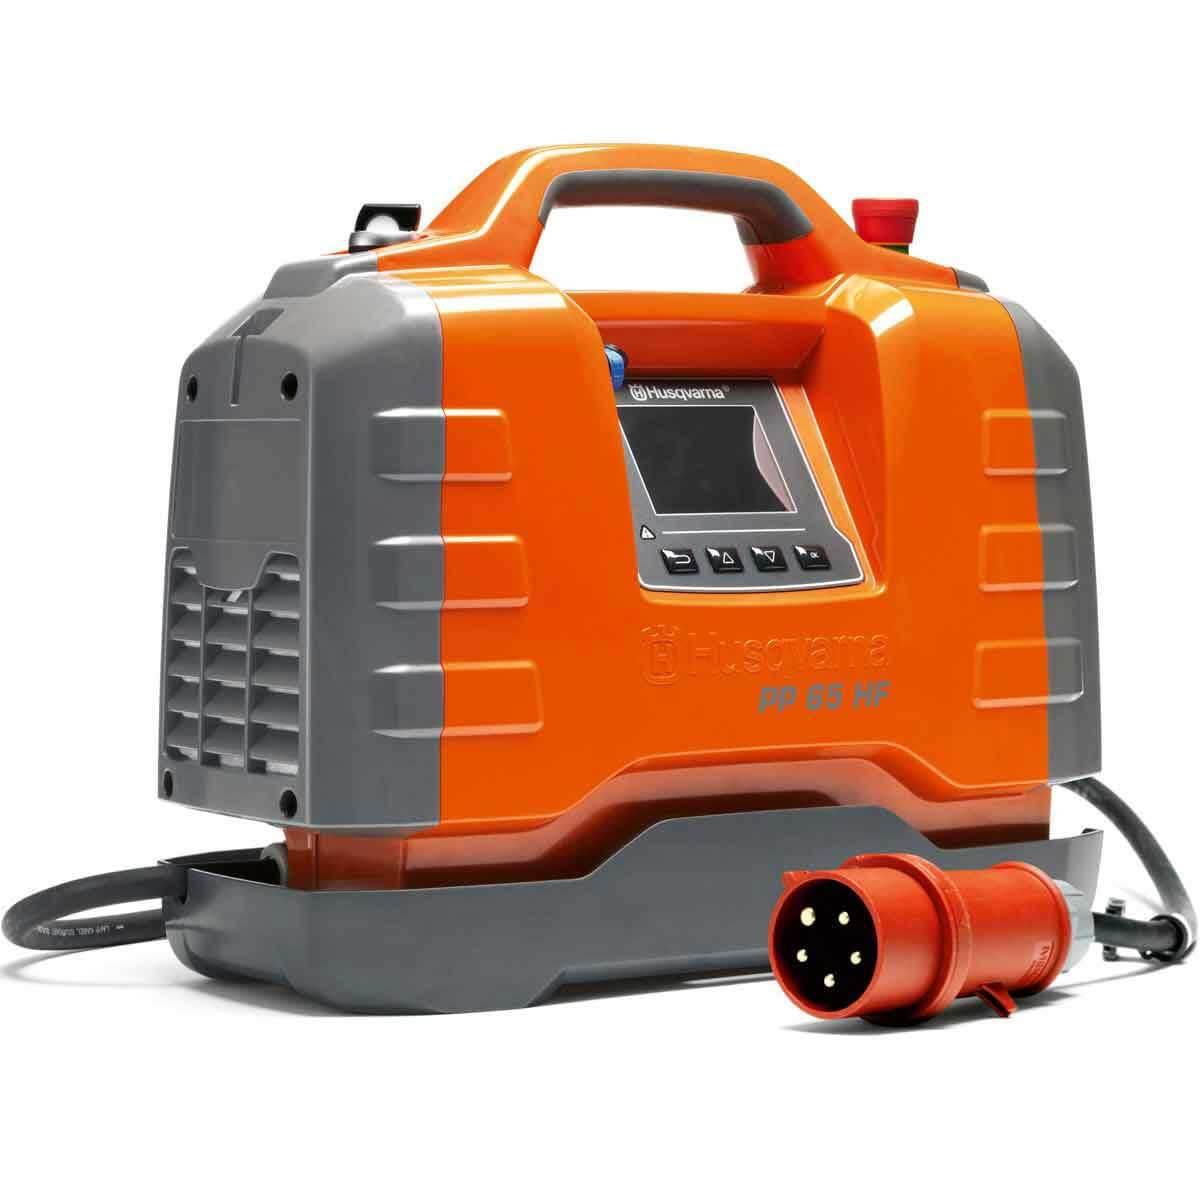 Husqvarna PP65 Power Pack plug